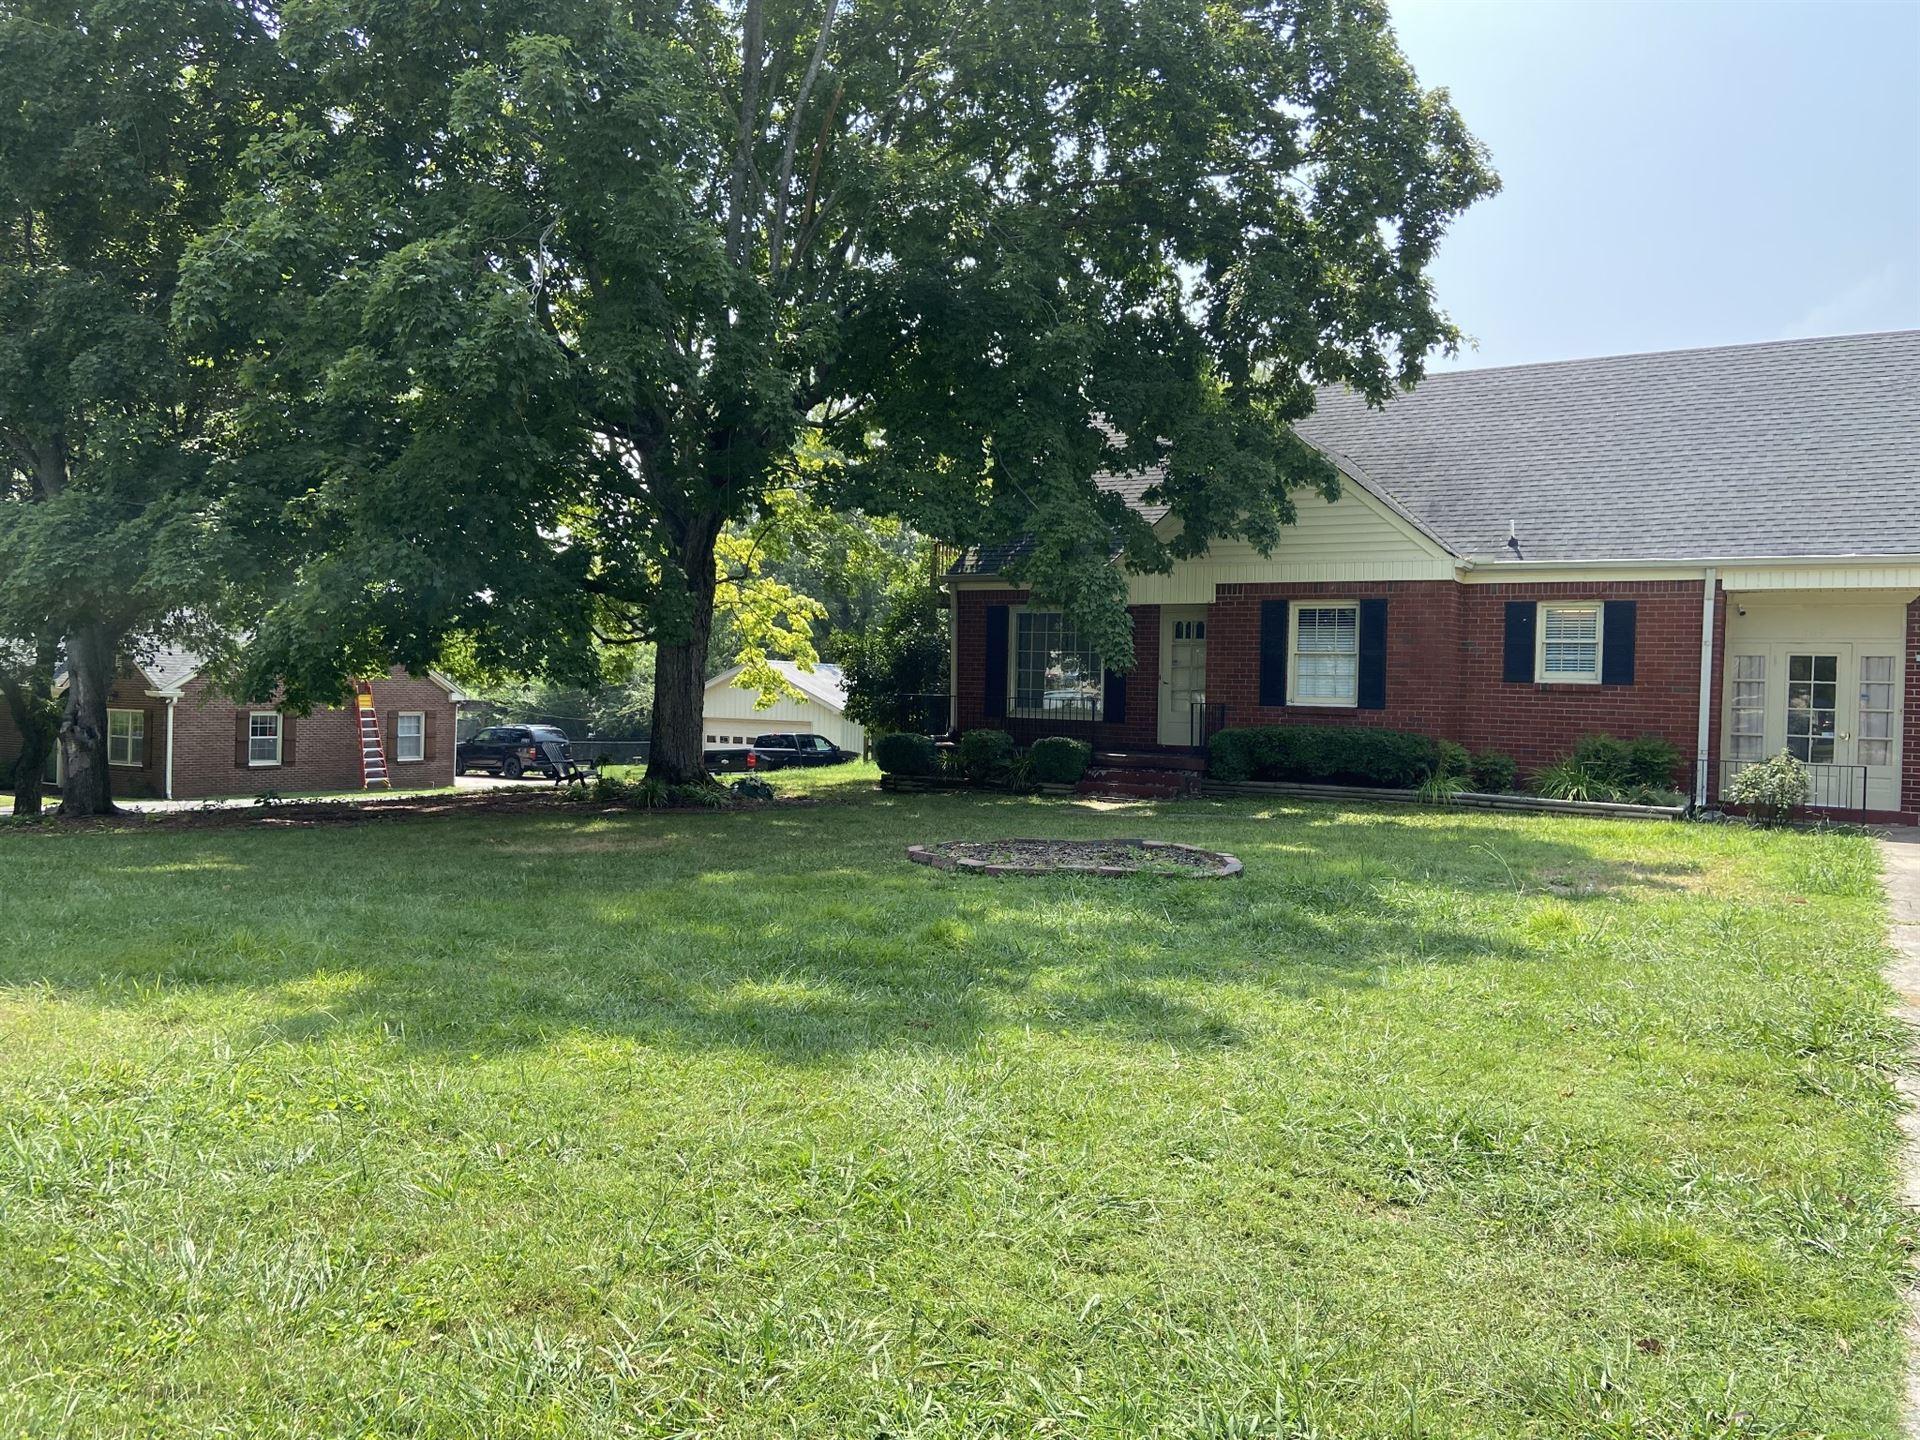 Photo of 109 Brentlawn Dr, Springfield, TN 37172 (MLS # 2277856)